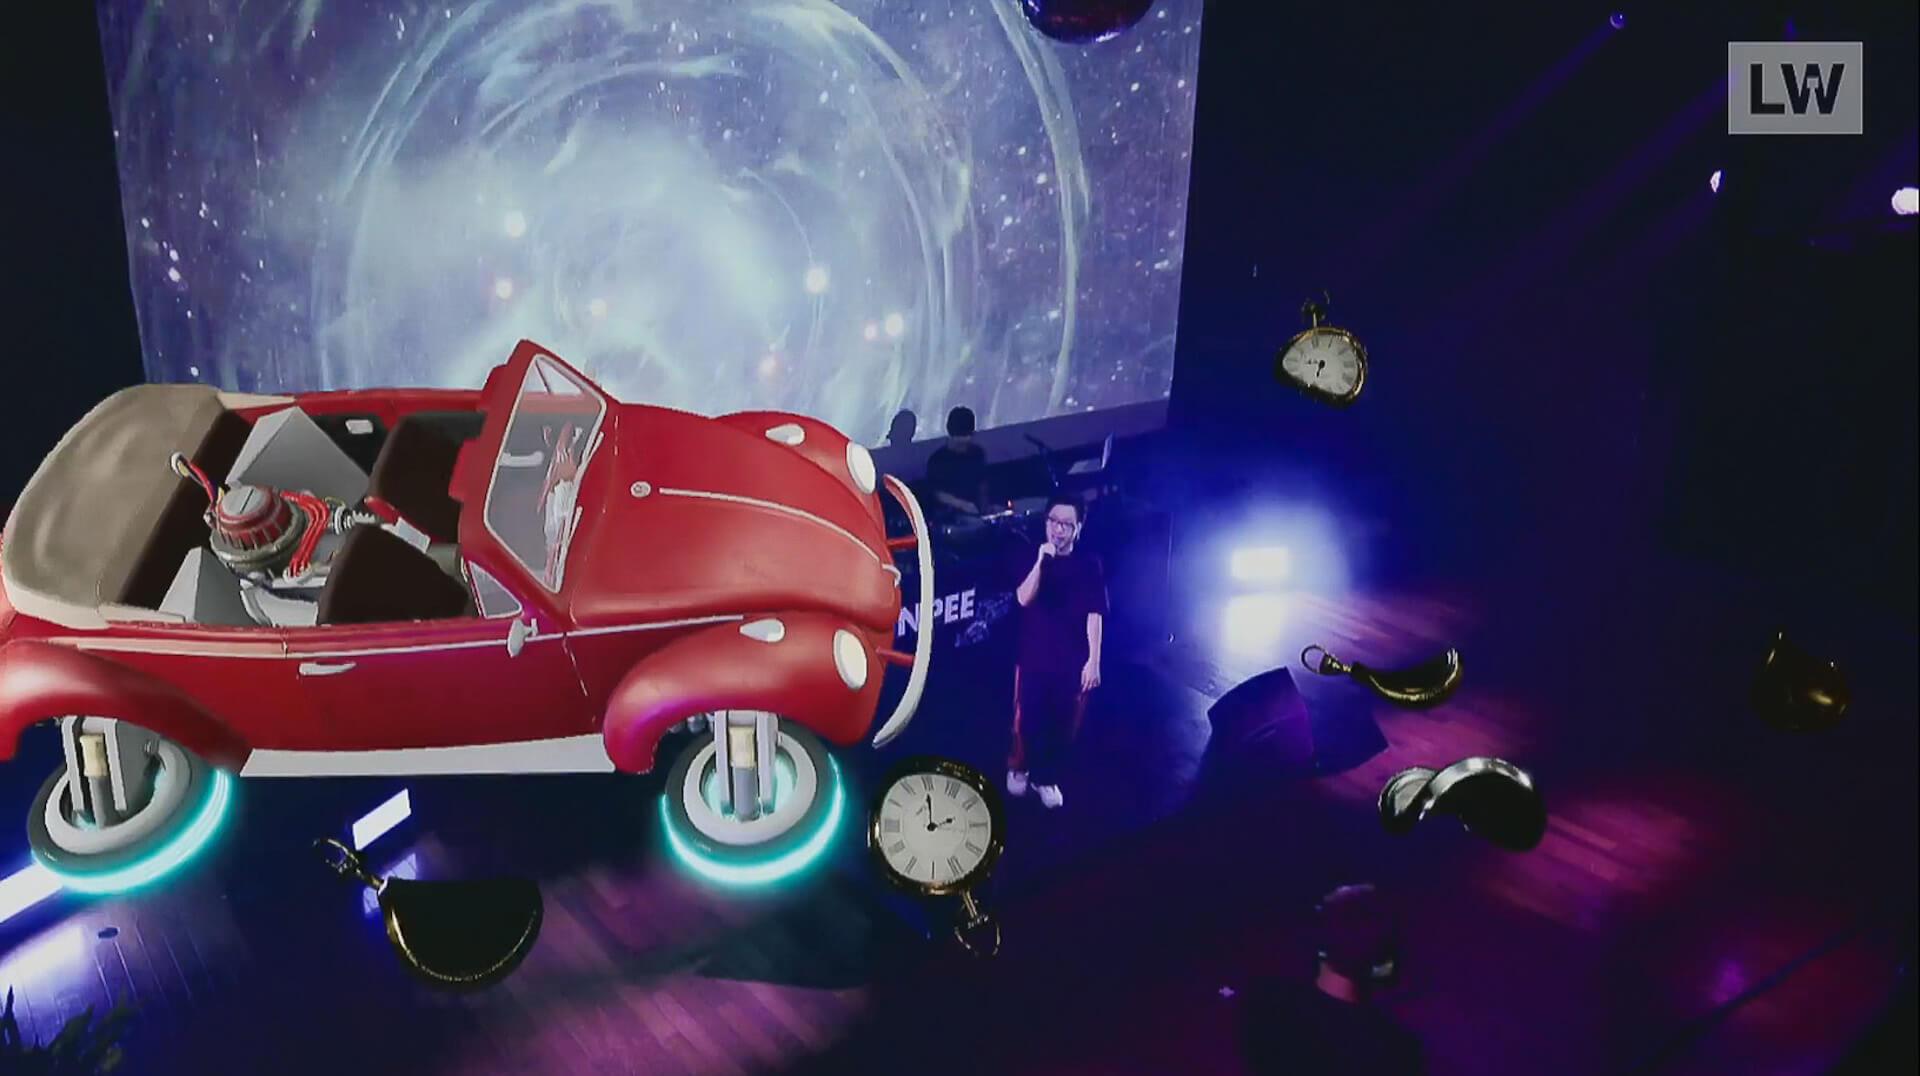 PUNPEEが生配信ライブ<PUNPEE Sofa Kingdomcom>を徹底解説!スペースシャワーTVにてディテールを語るトーク番組が放送決定 music201102_punpee_live_4